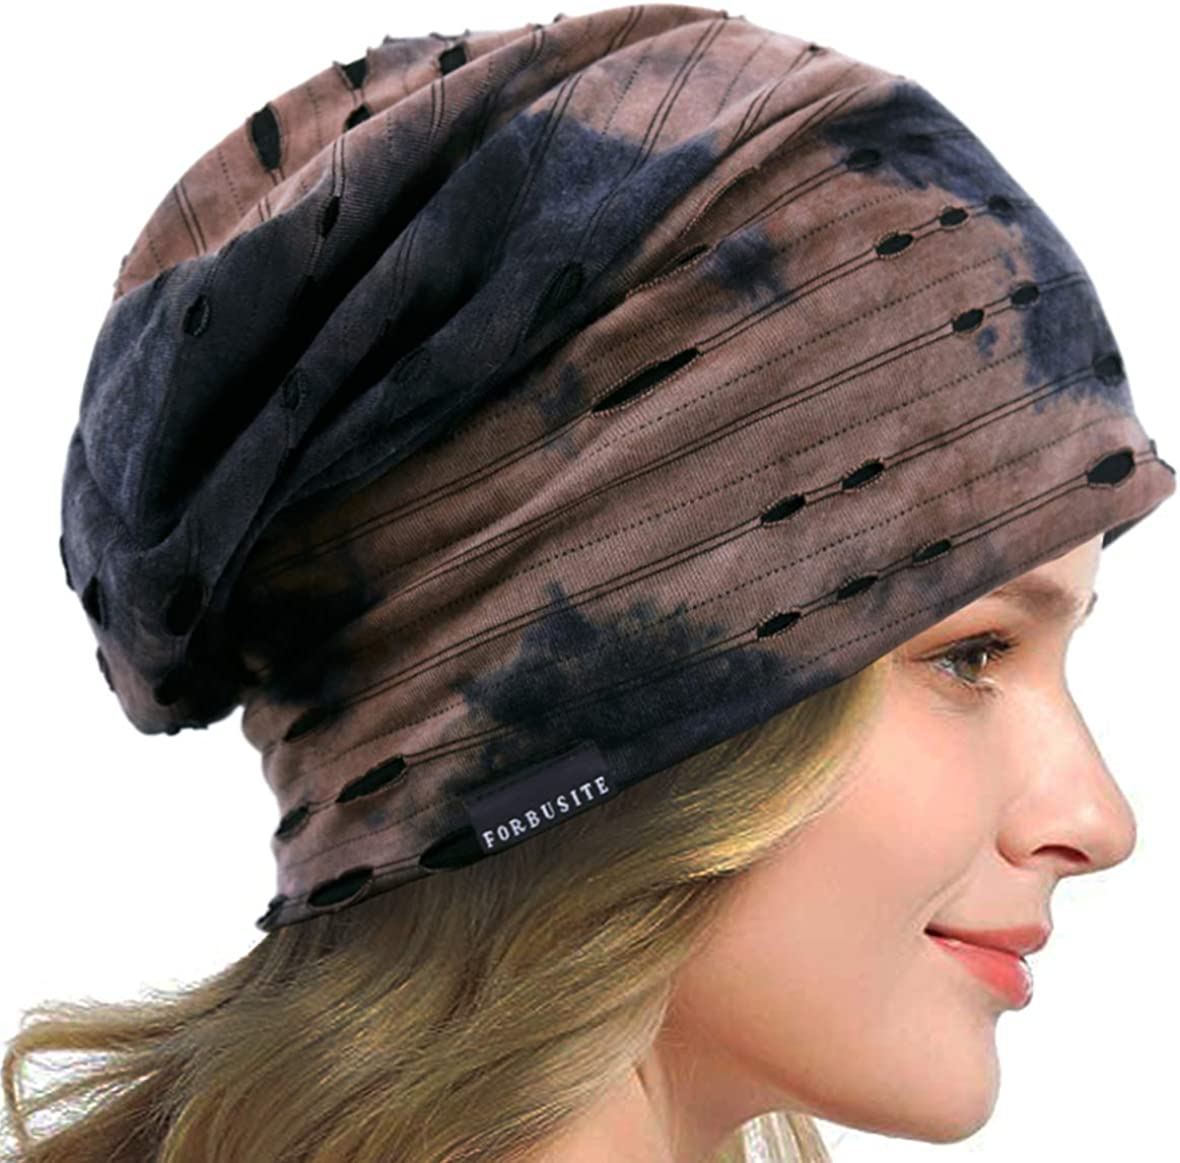 Womens Slouchy Beanie Thin Soft Lined Sleep Cap Lightweight Chemo Slap Summer Hat